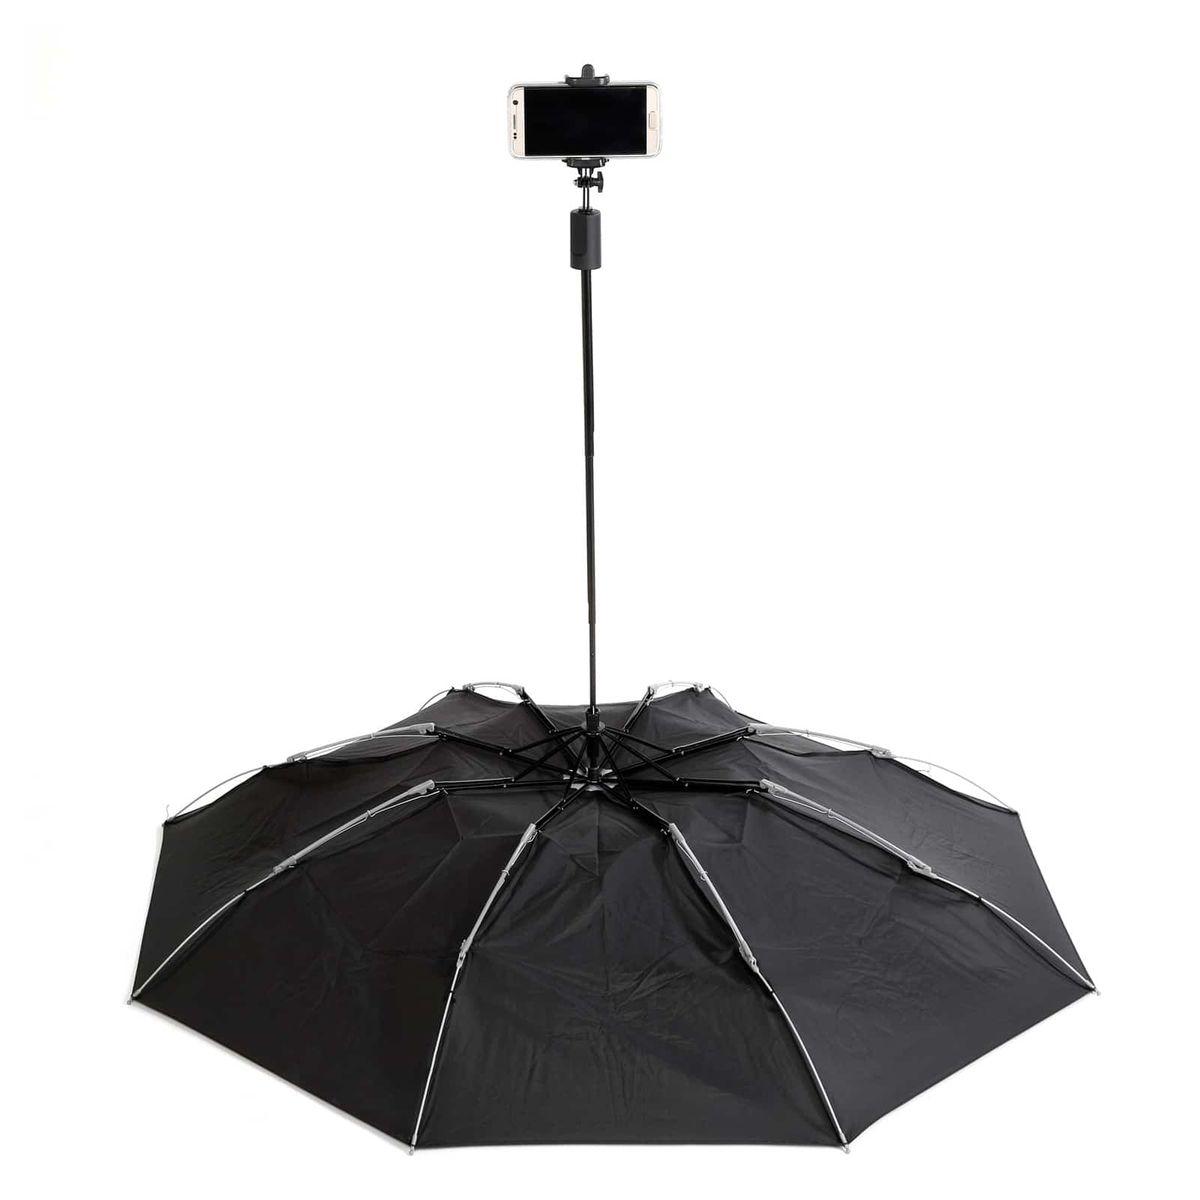 Parapluie selfie stick